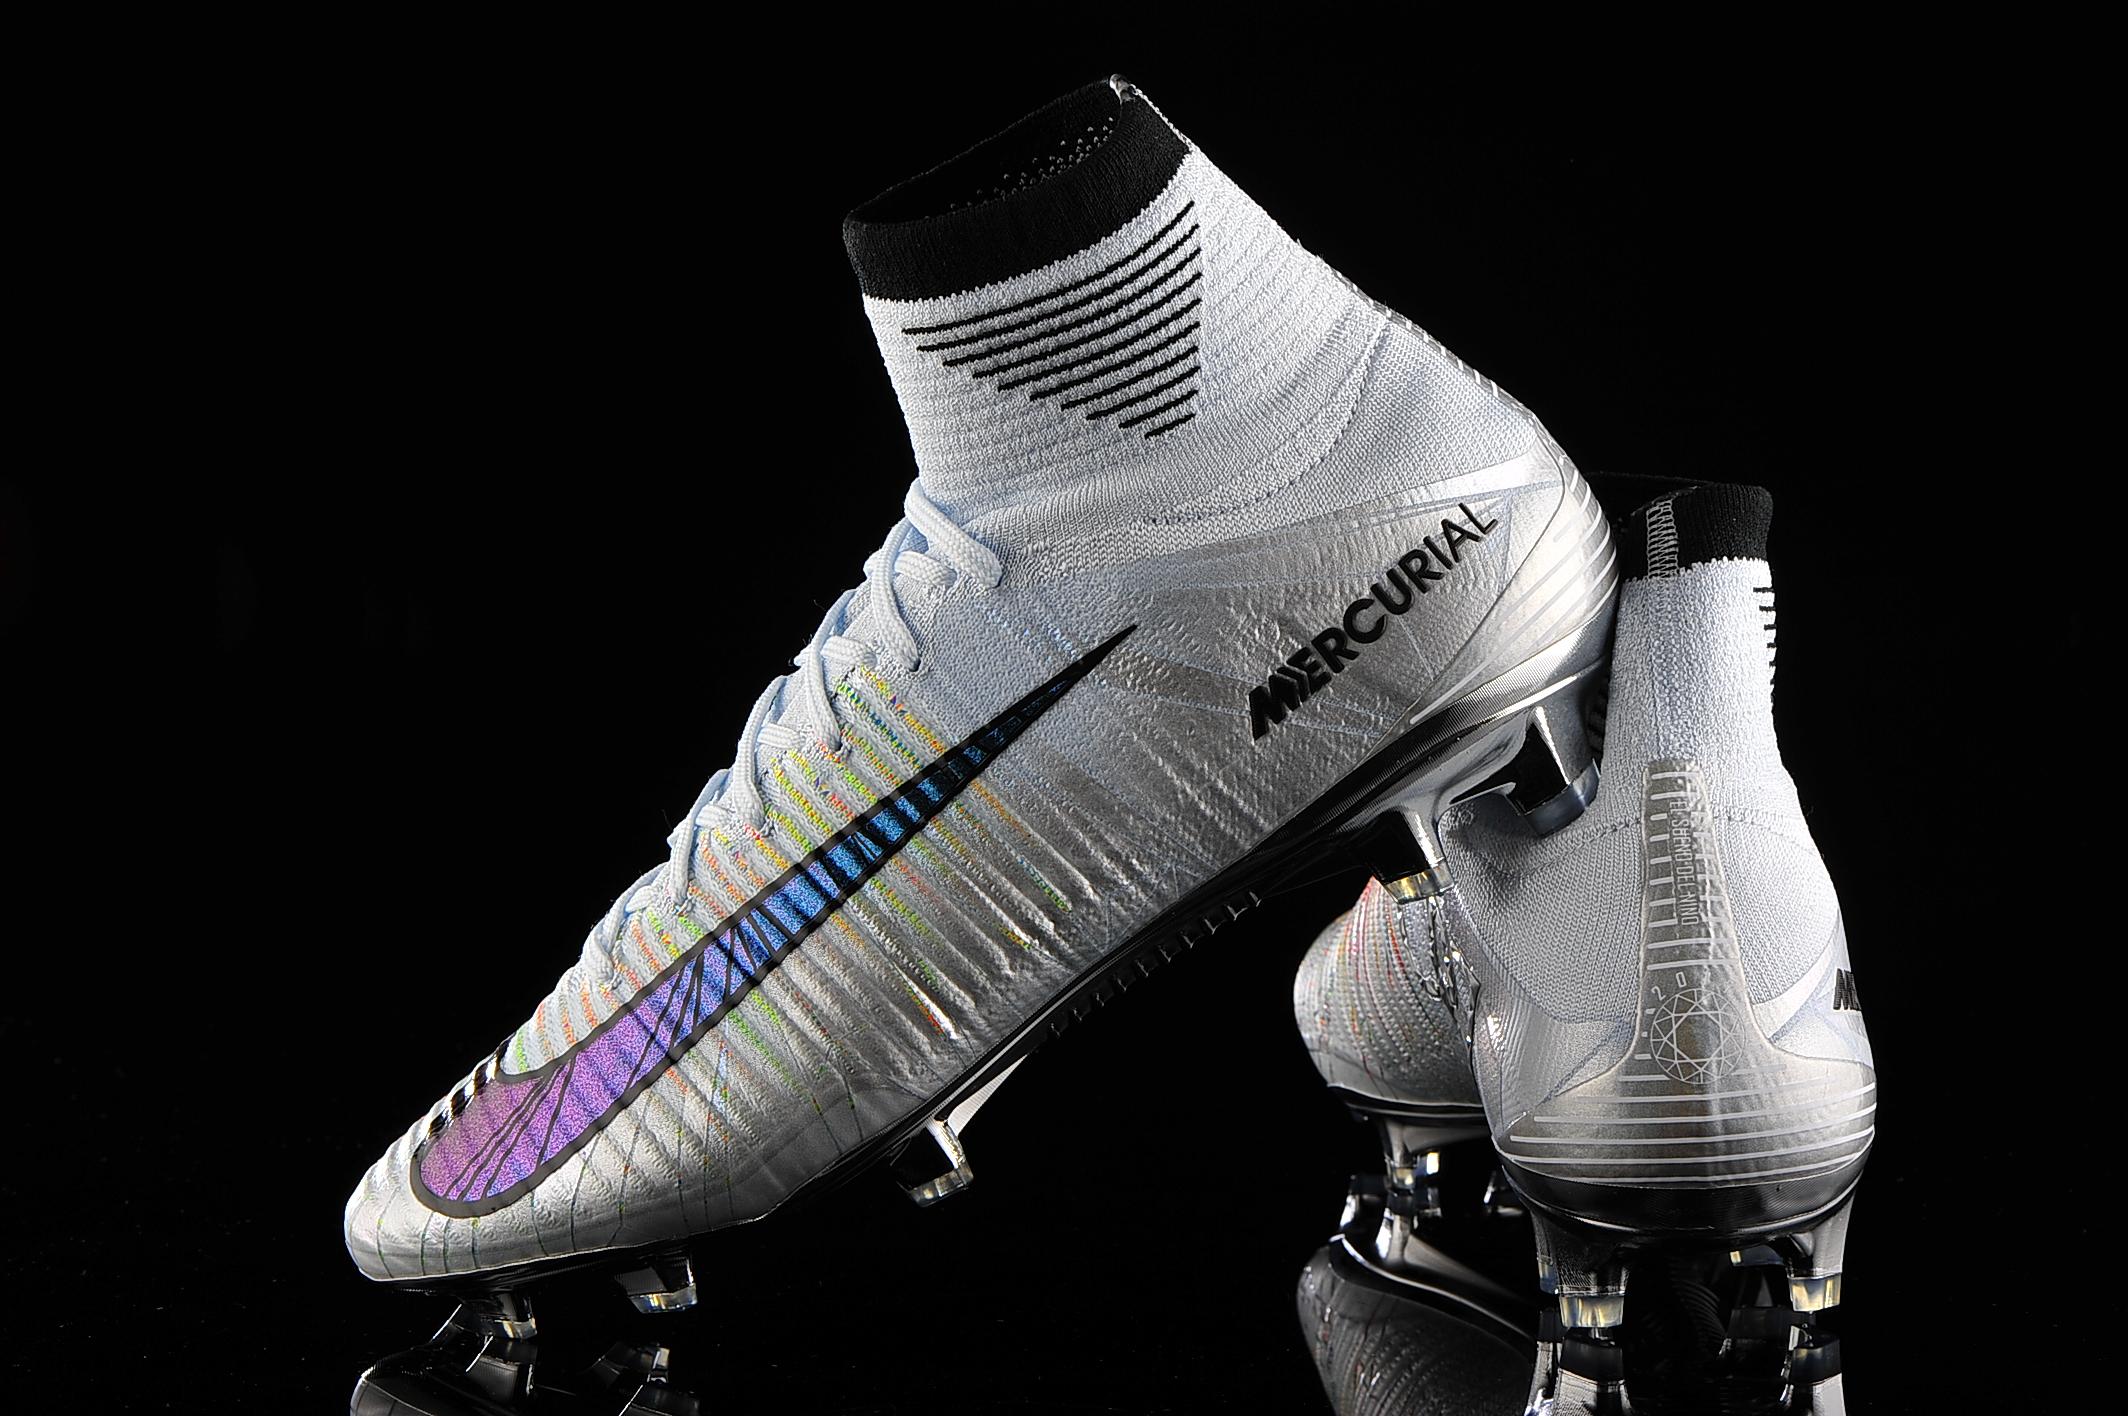 Nike CR7 Vapor 12 Academy Multi Ground Mens Soccer Cleat